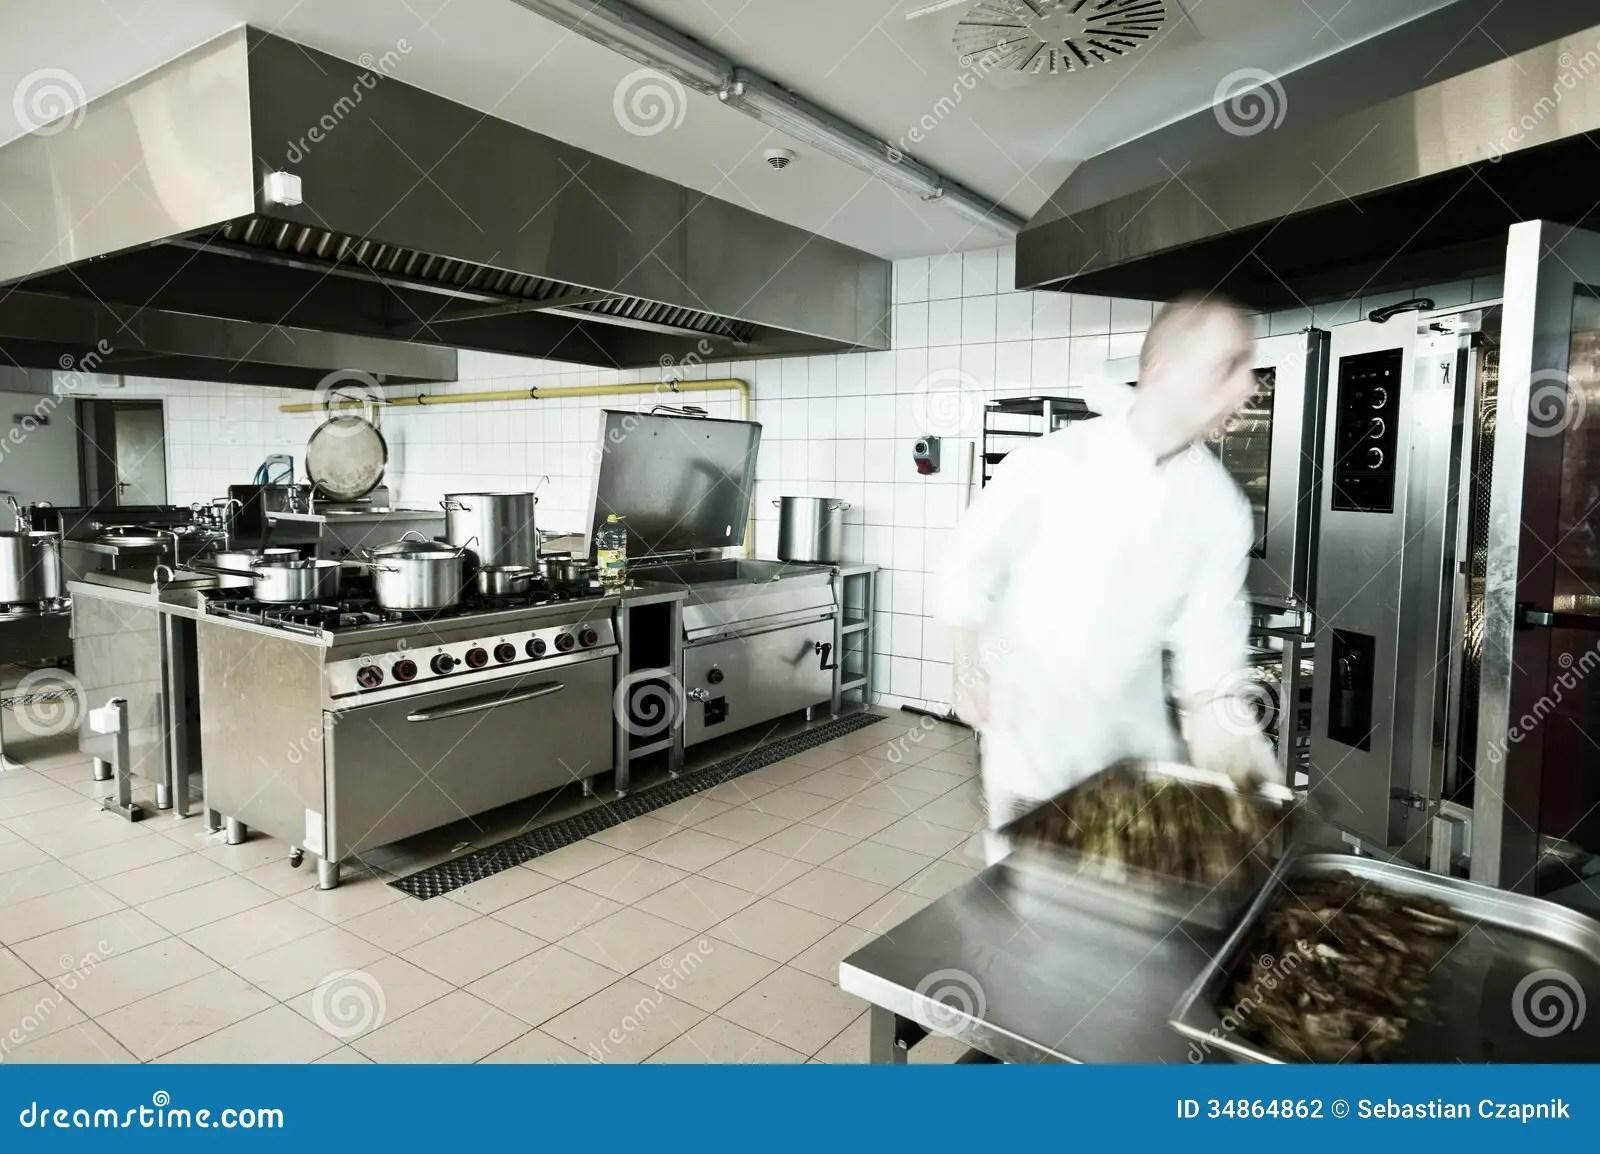 commercial kitchen equipment design commercial kitchen equipment commercial kitchen design equipment hoods sinks messagenote